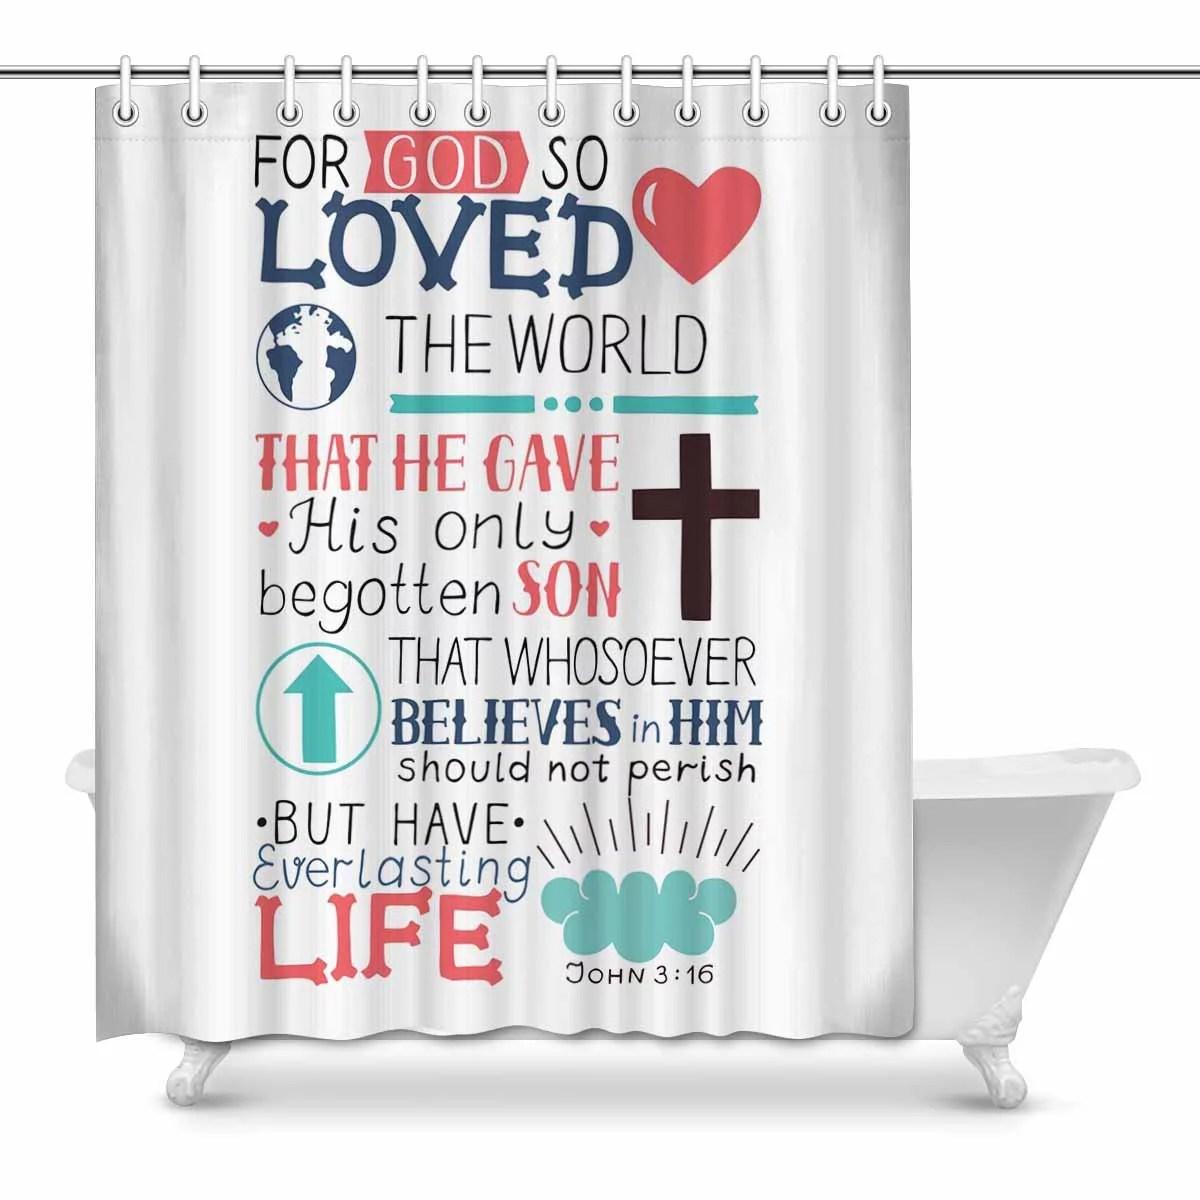 Mkhert Christian Bible Verse John 3 16 For So Loved The World Decor Waterproof Polyester Bathroom Shower Curtain Bath Decorations 60x72 Inch